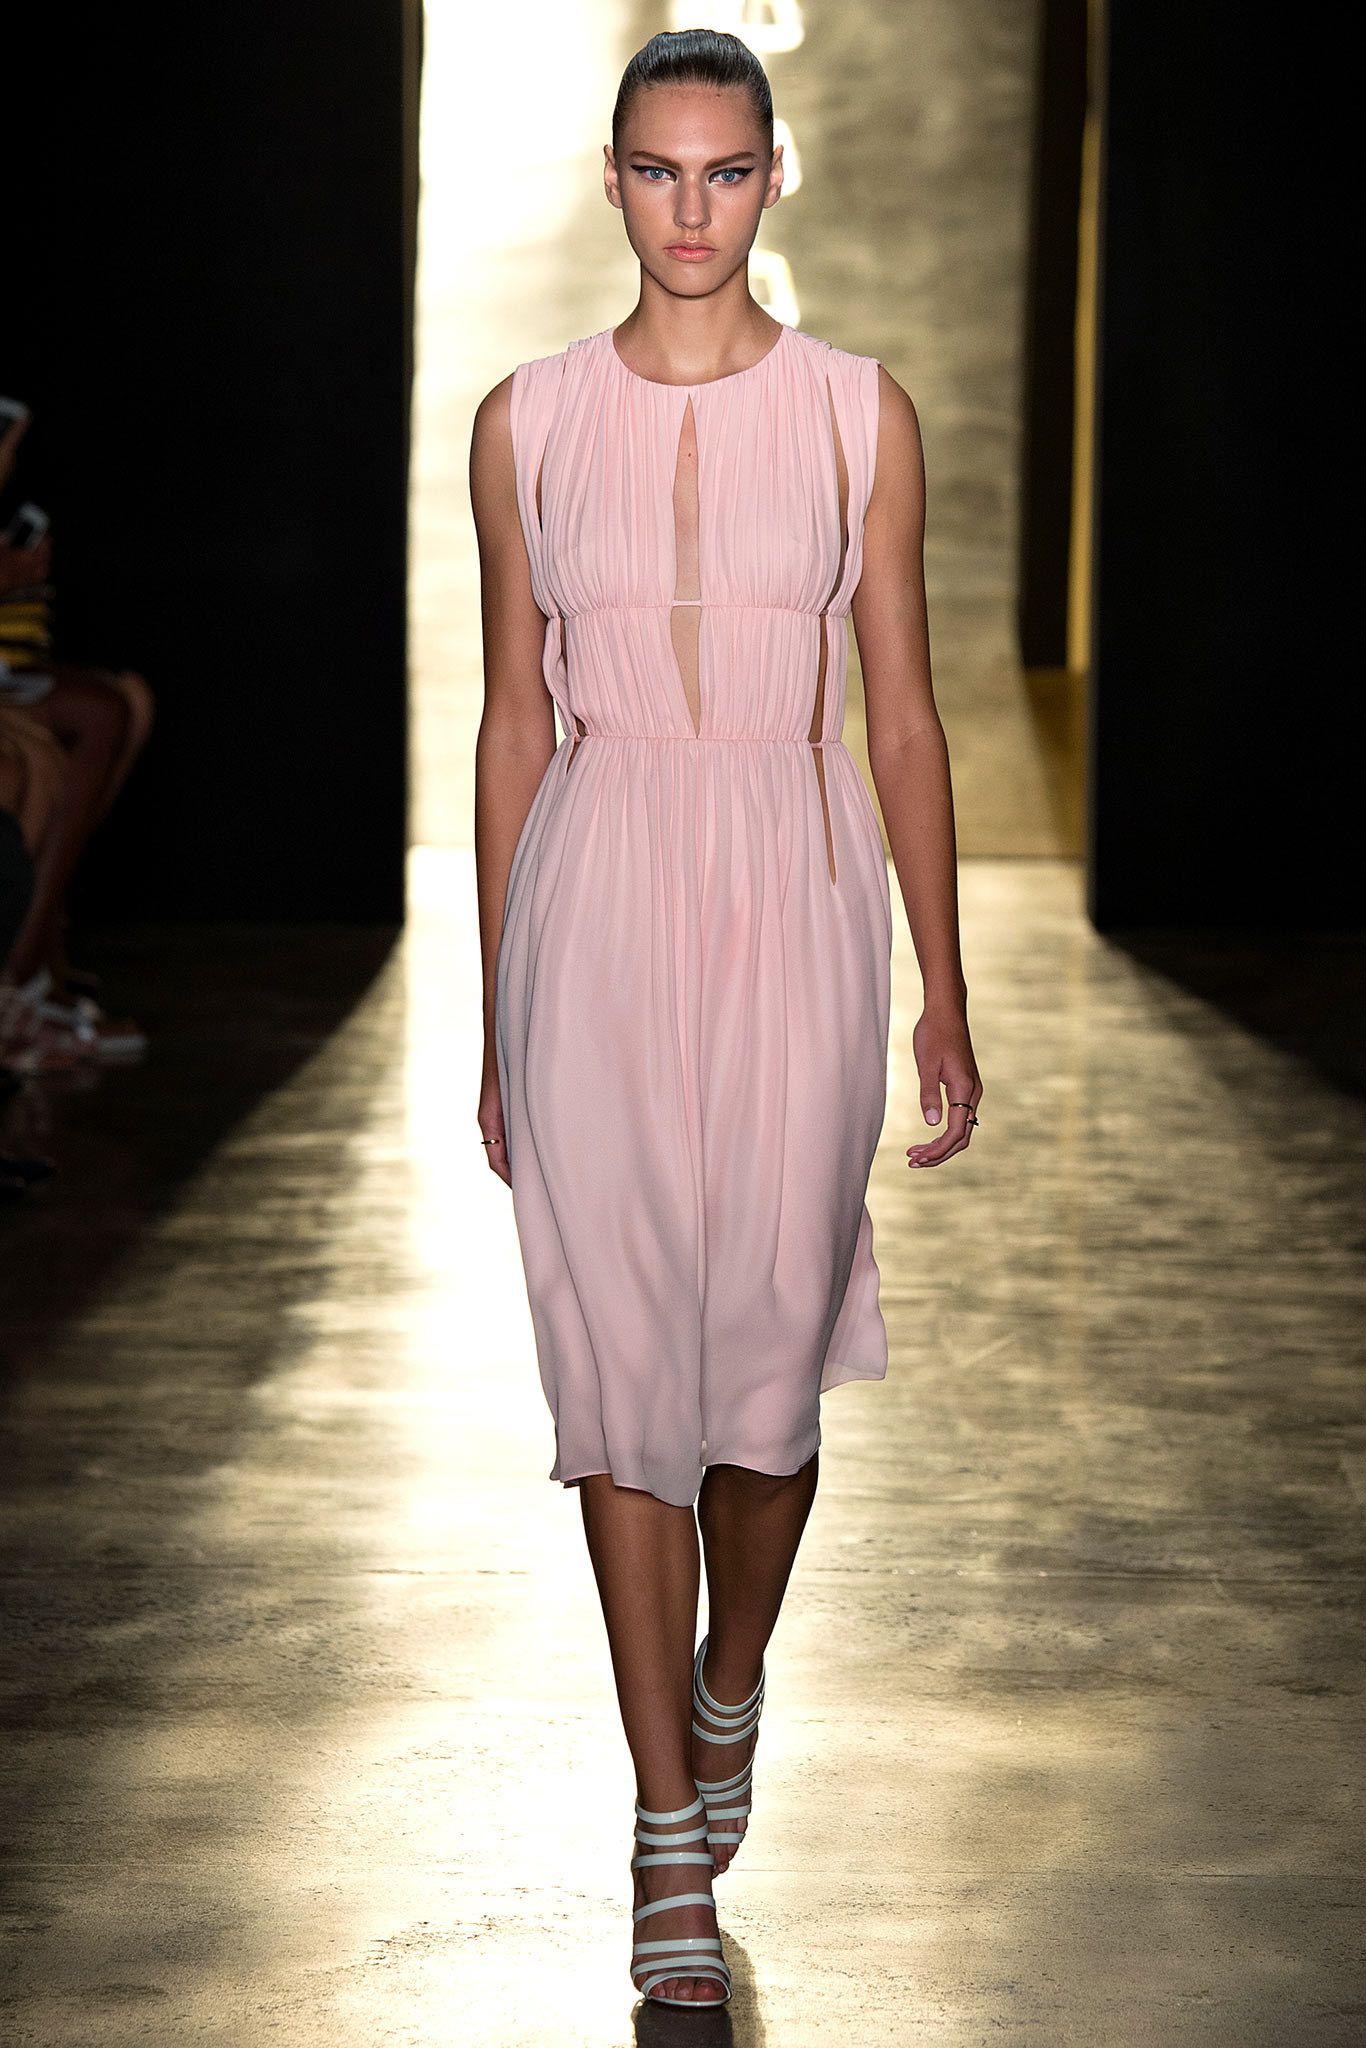 Cushnie et Ochs Spring 2015 Ready-to-Wear Fashion Show - Maggie Jablonski